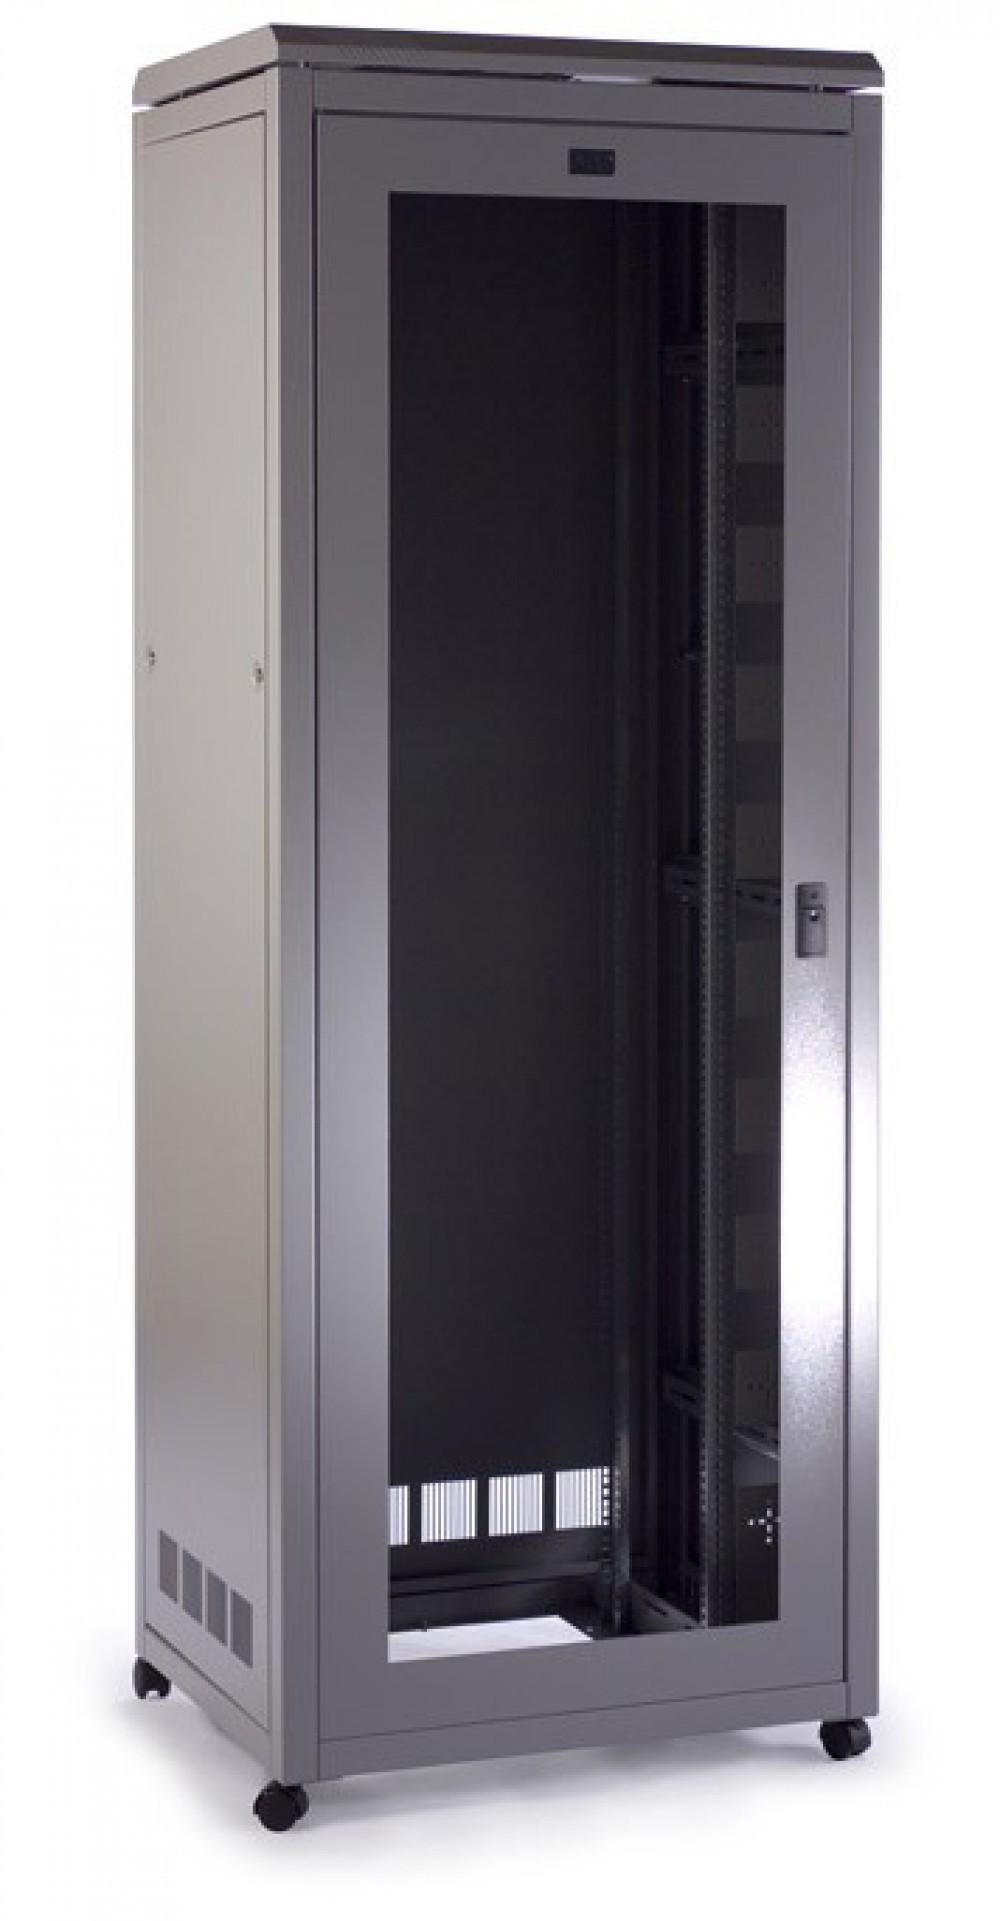 Prism Free Standing Cabinet 39U (1930x800x800)